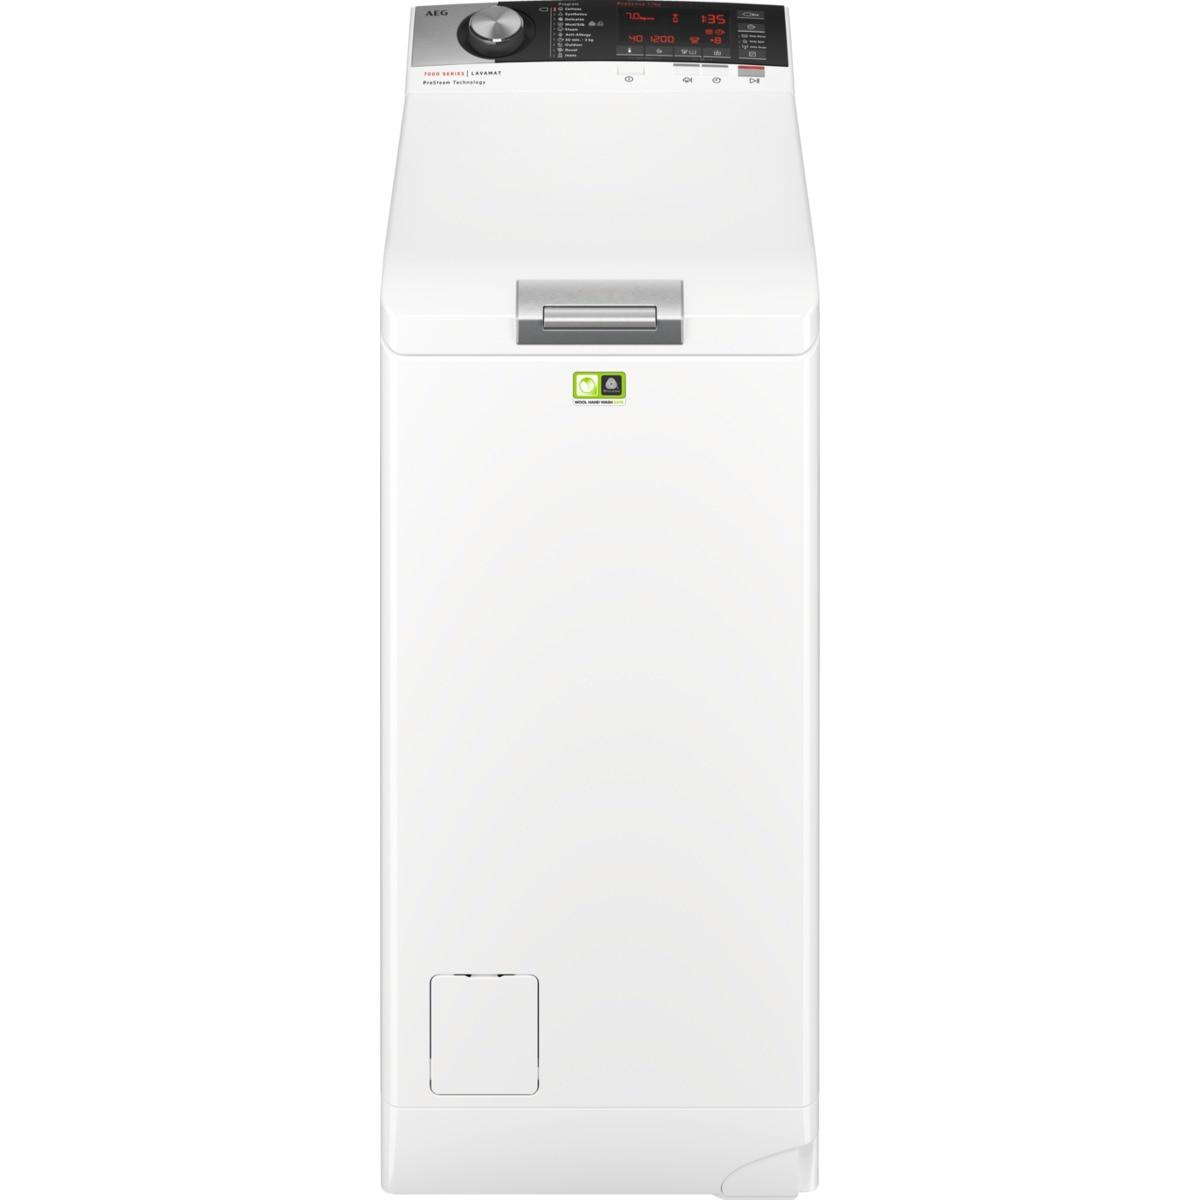 Fotografie Masina de spalat rufe cu incarcare verticala AEG LTX7C373E, 7 kg, 1300 RPM, Tehnologie ProSteam, Motor Inverter, Display LCD, Iluminare Tambur, Clasa D, Alb